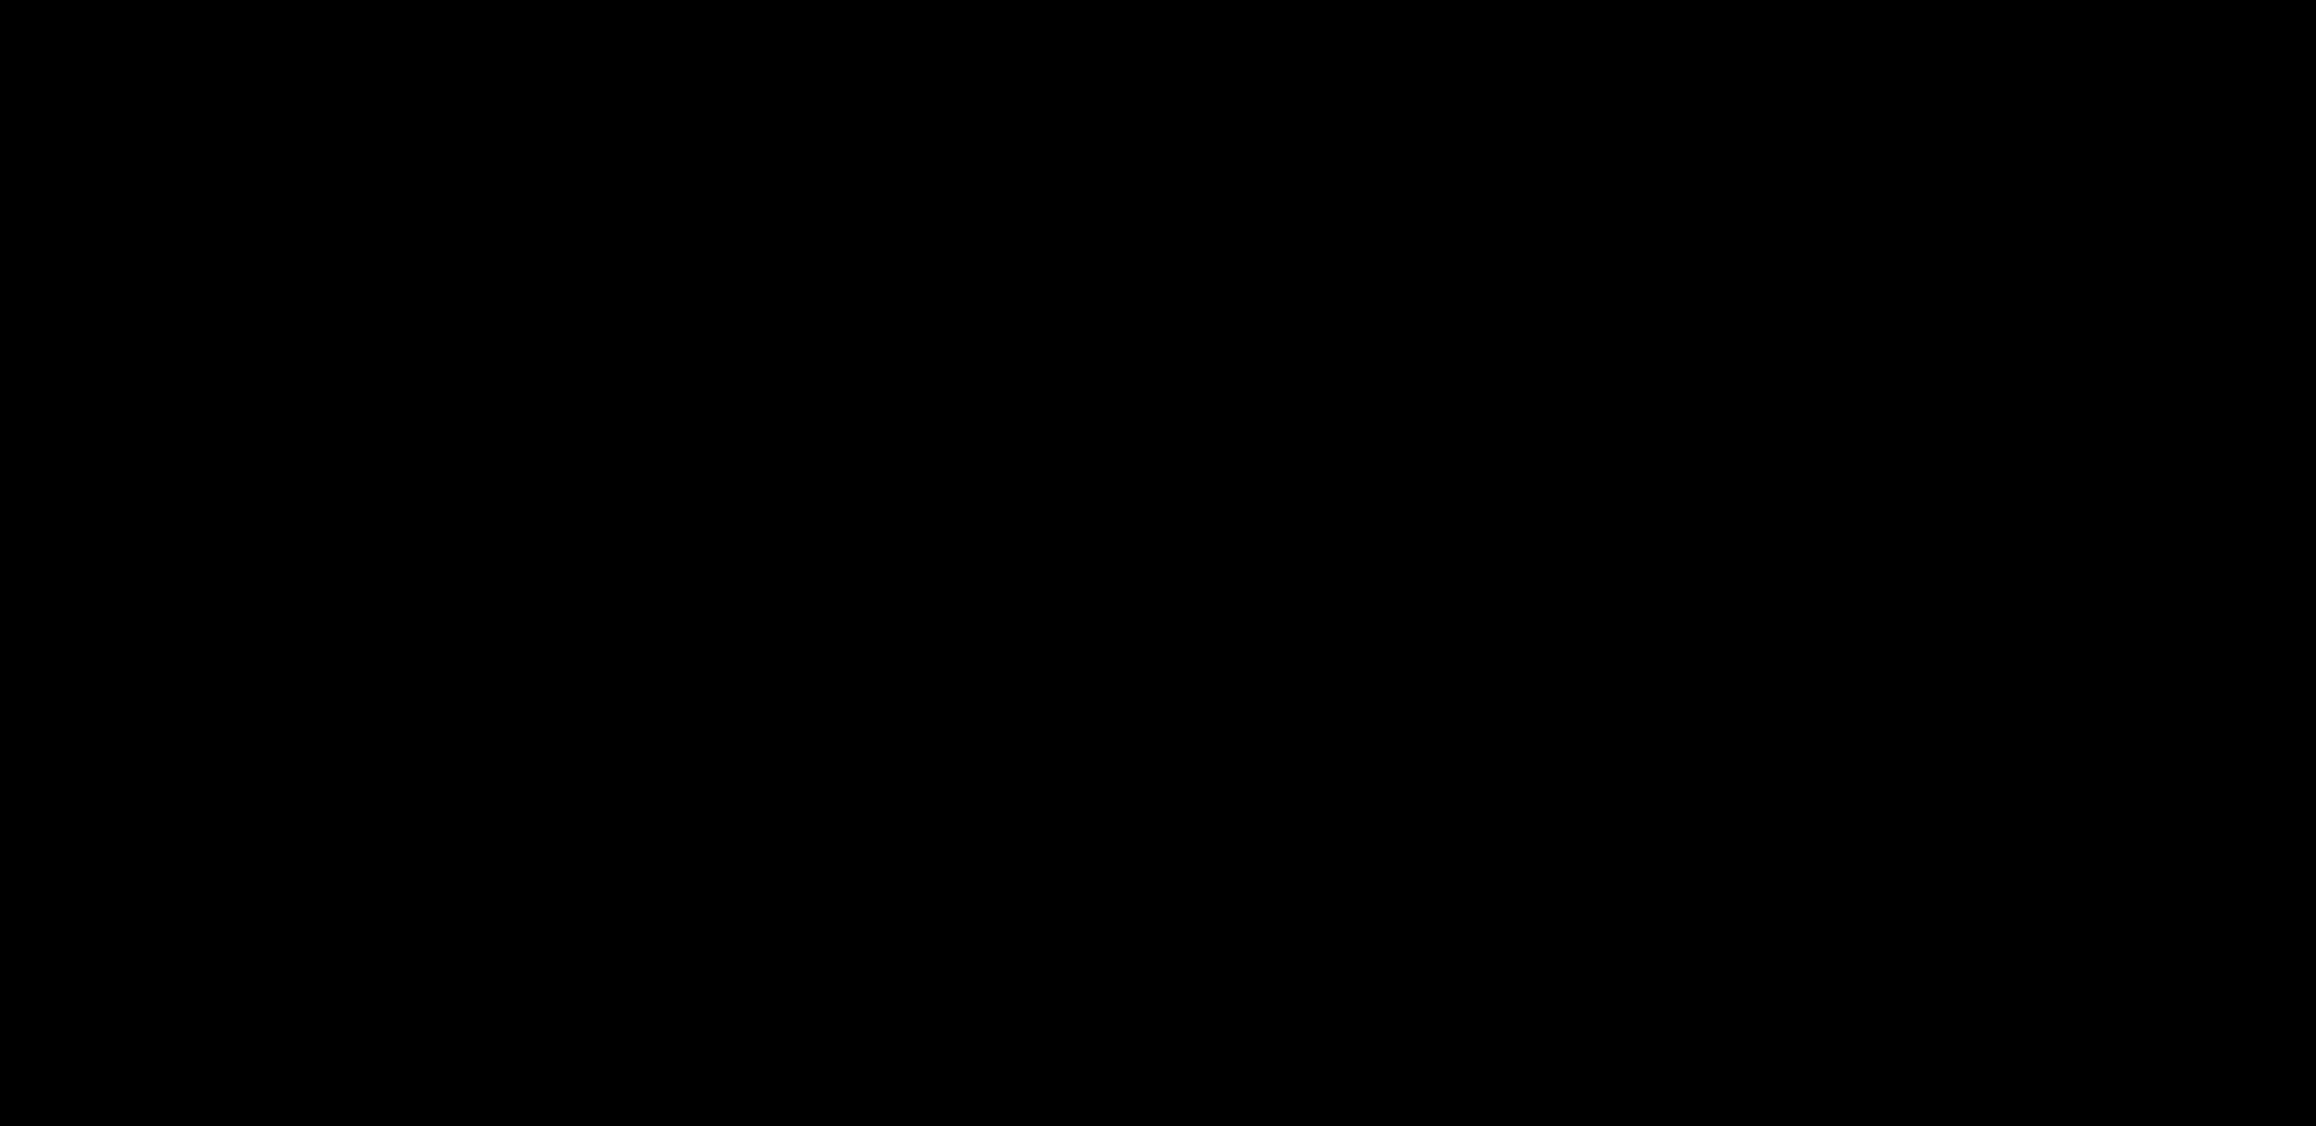 Infinity Symbol Skyline Vector File Image Free Stock Photo